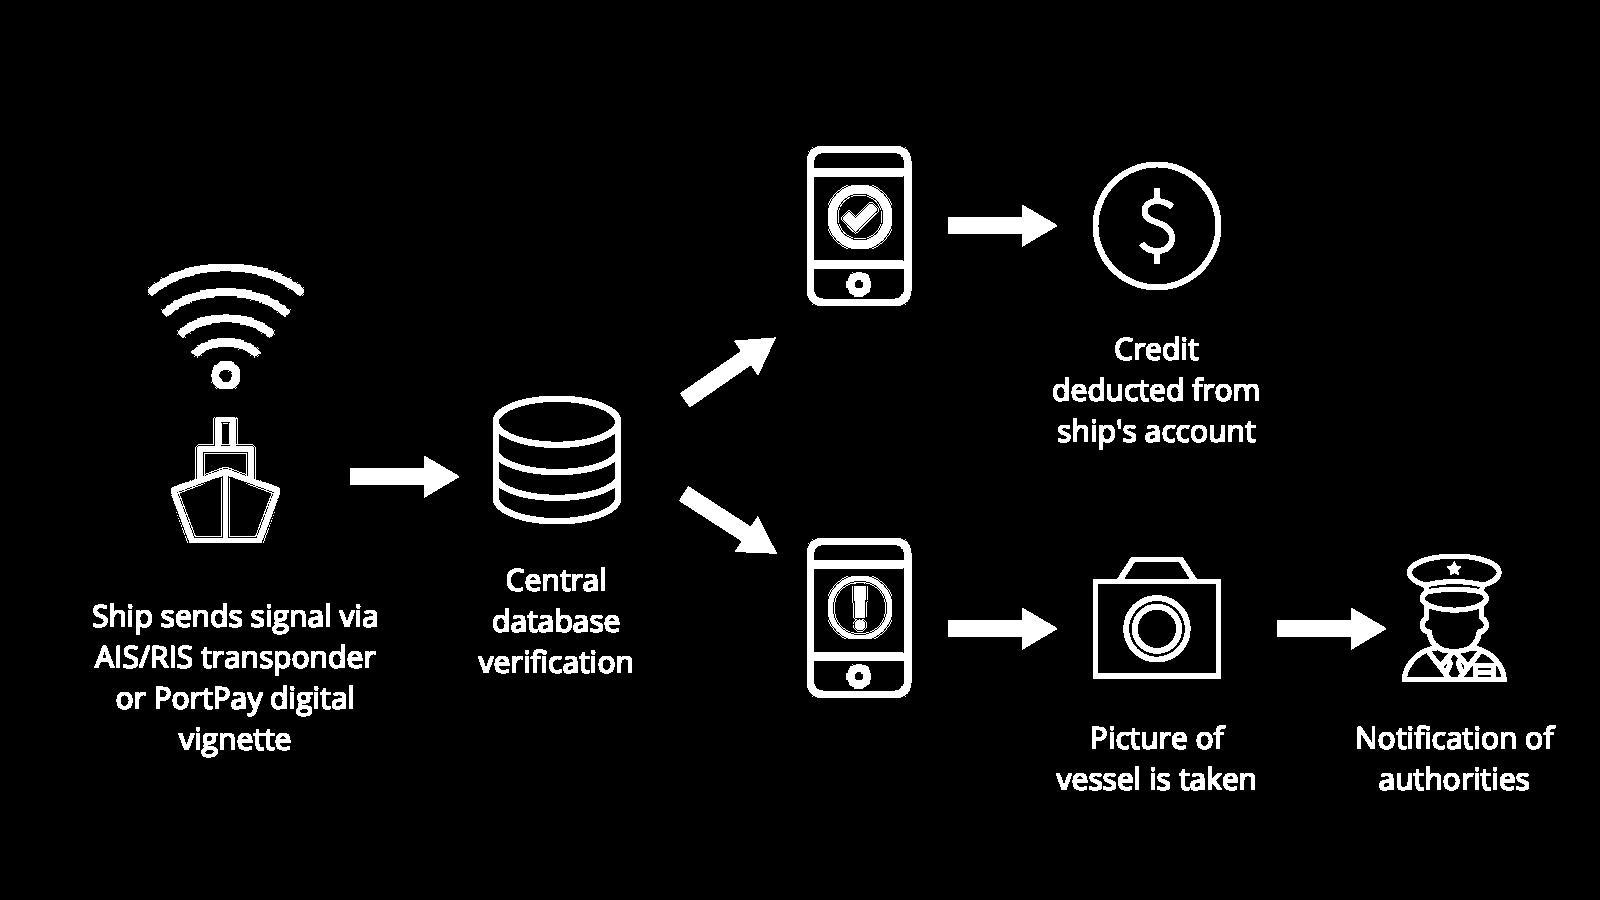 portpay diagram.png